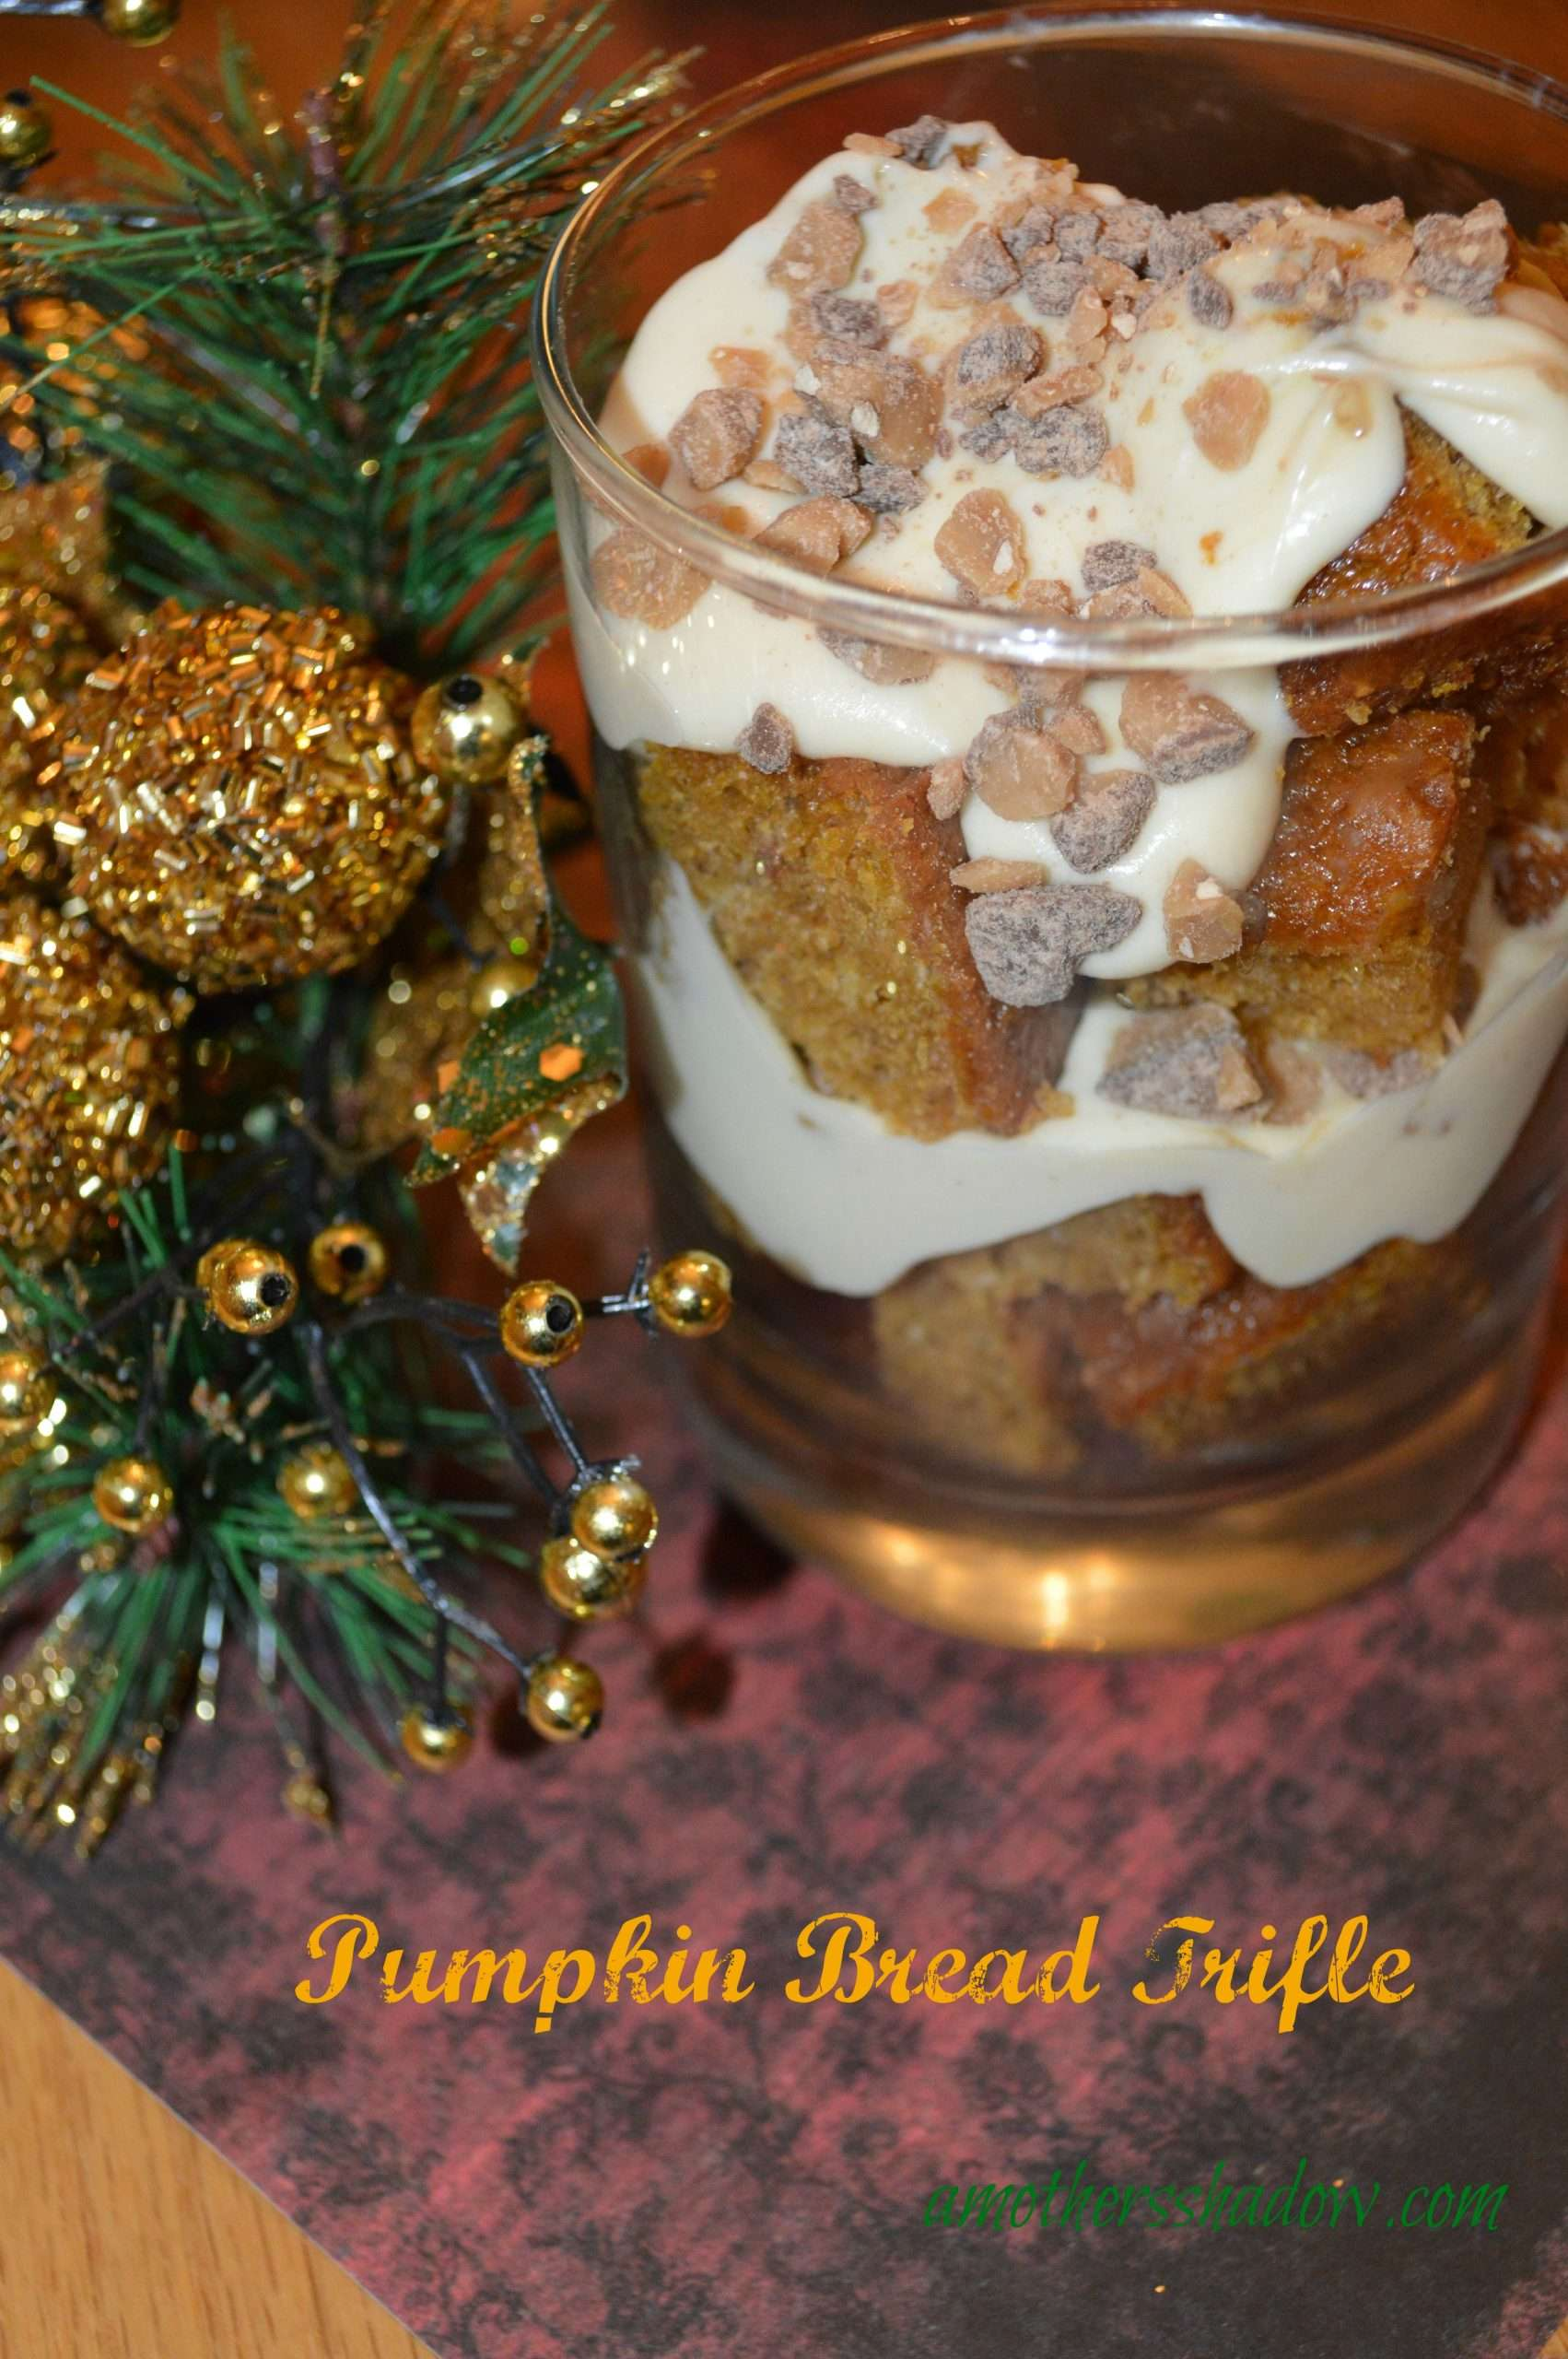 Amazing Pumpkin Creamy Toffee Trifle